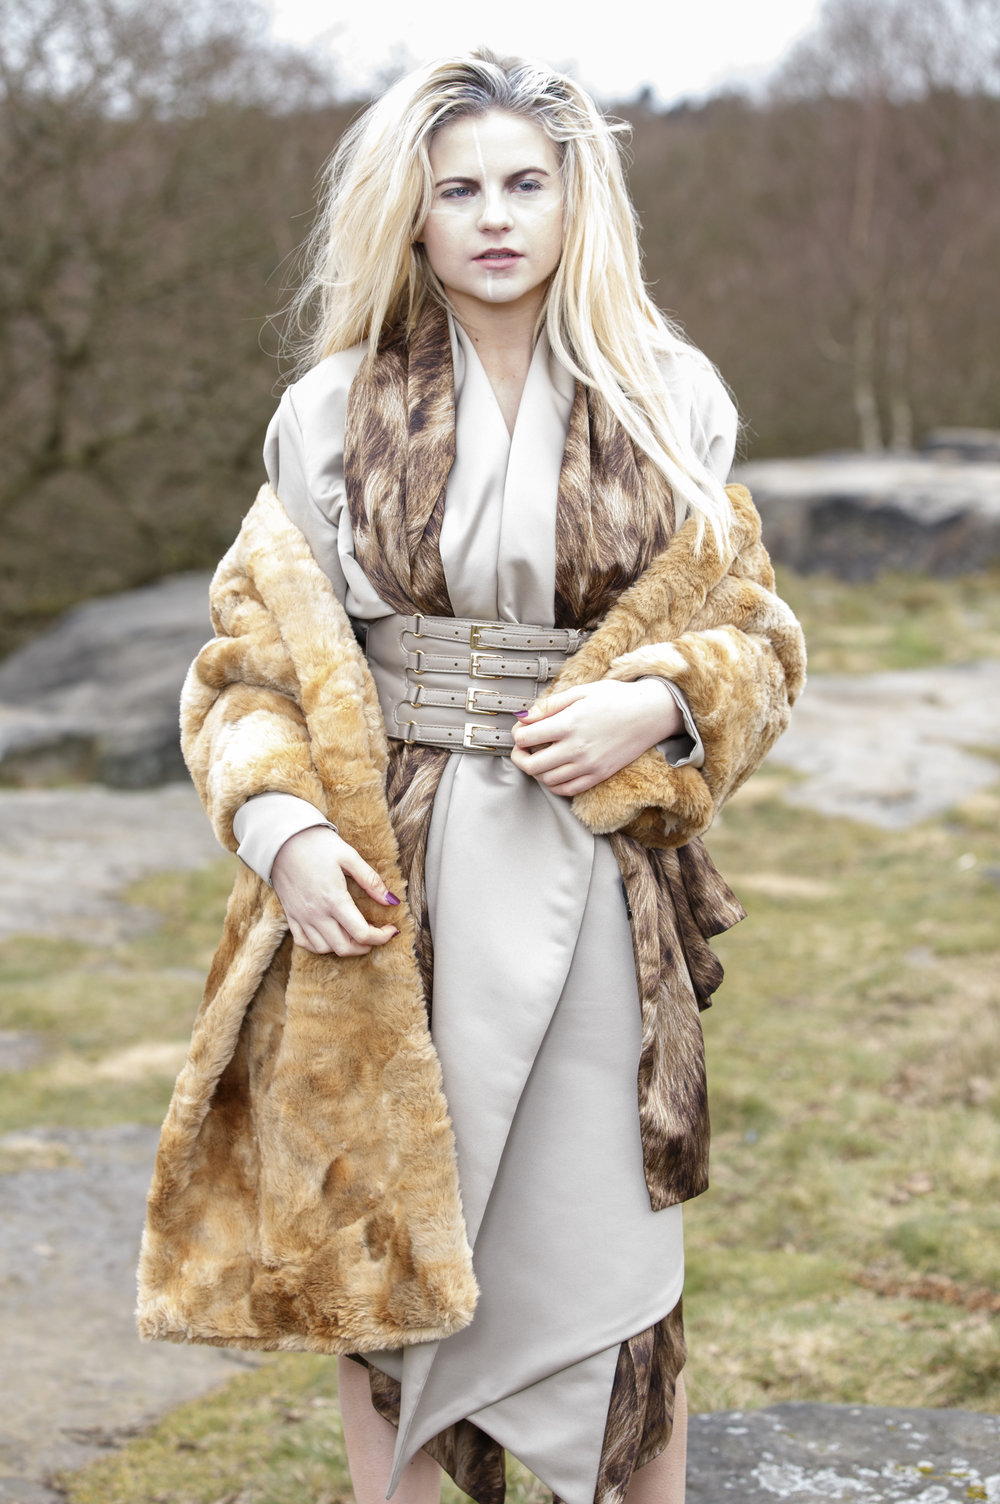 zaramia-ava-zaramiaava-leeds-fashion-designer-ethical-sustainable-nude-versatile-drape-wrap-beige-cowl-white-dress-styling-location-womenswear-models-photoshoot-location-mai-faux-fur-emi-bodysuit-9